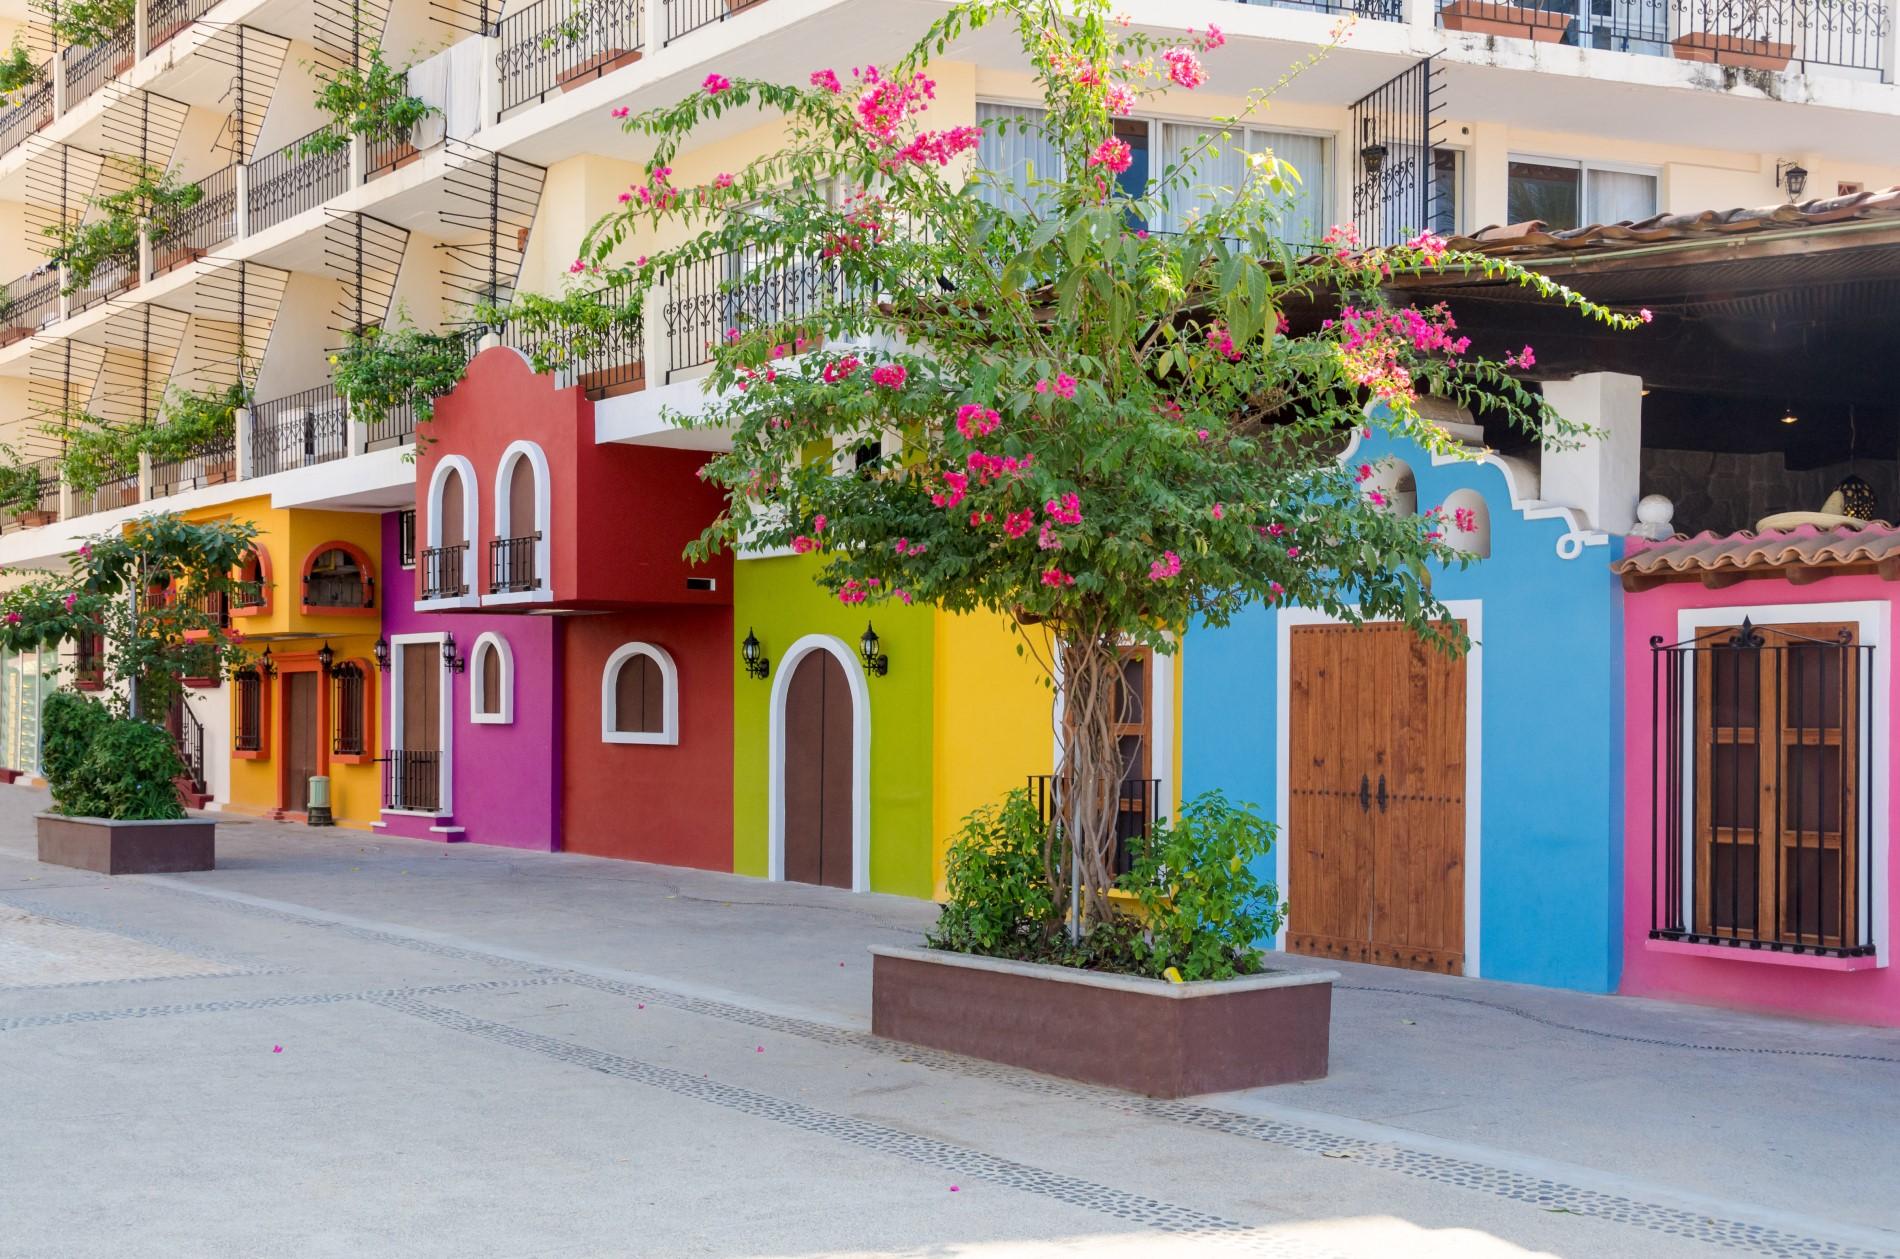 Zona Romántica - The heart of Puerto Vallarta